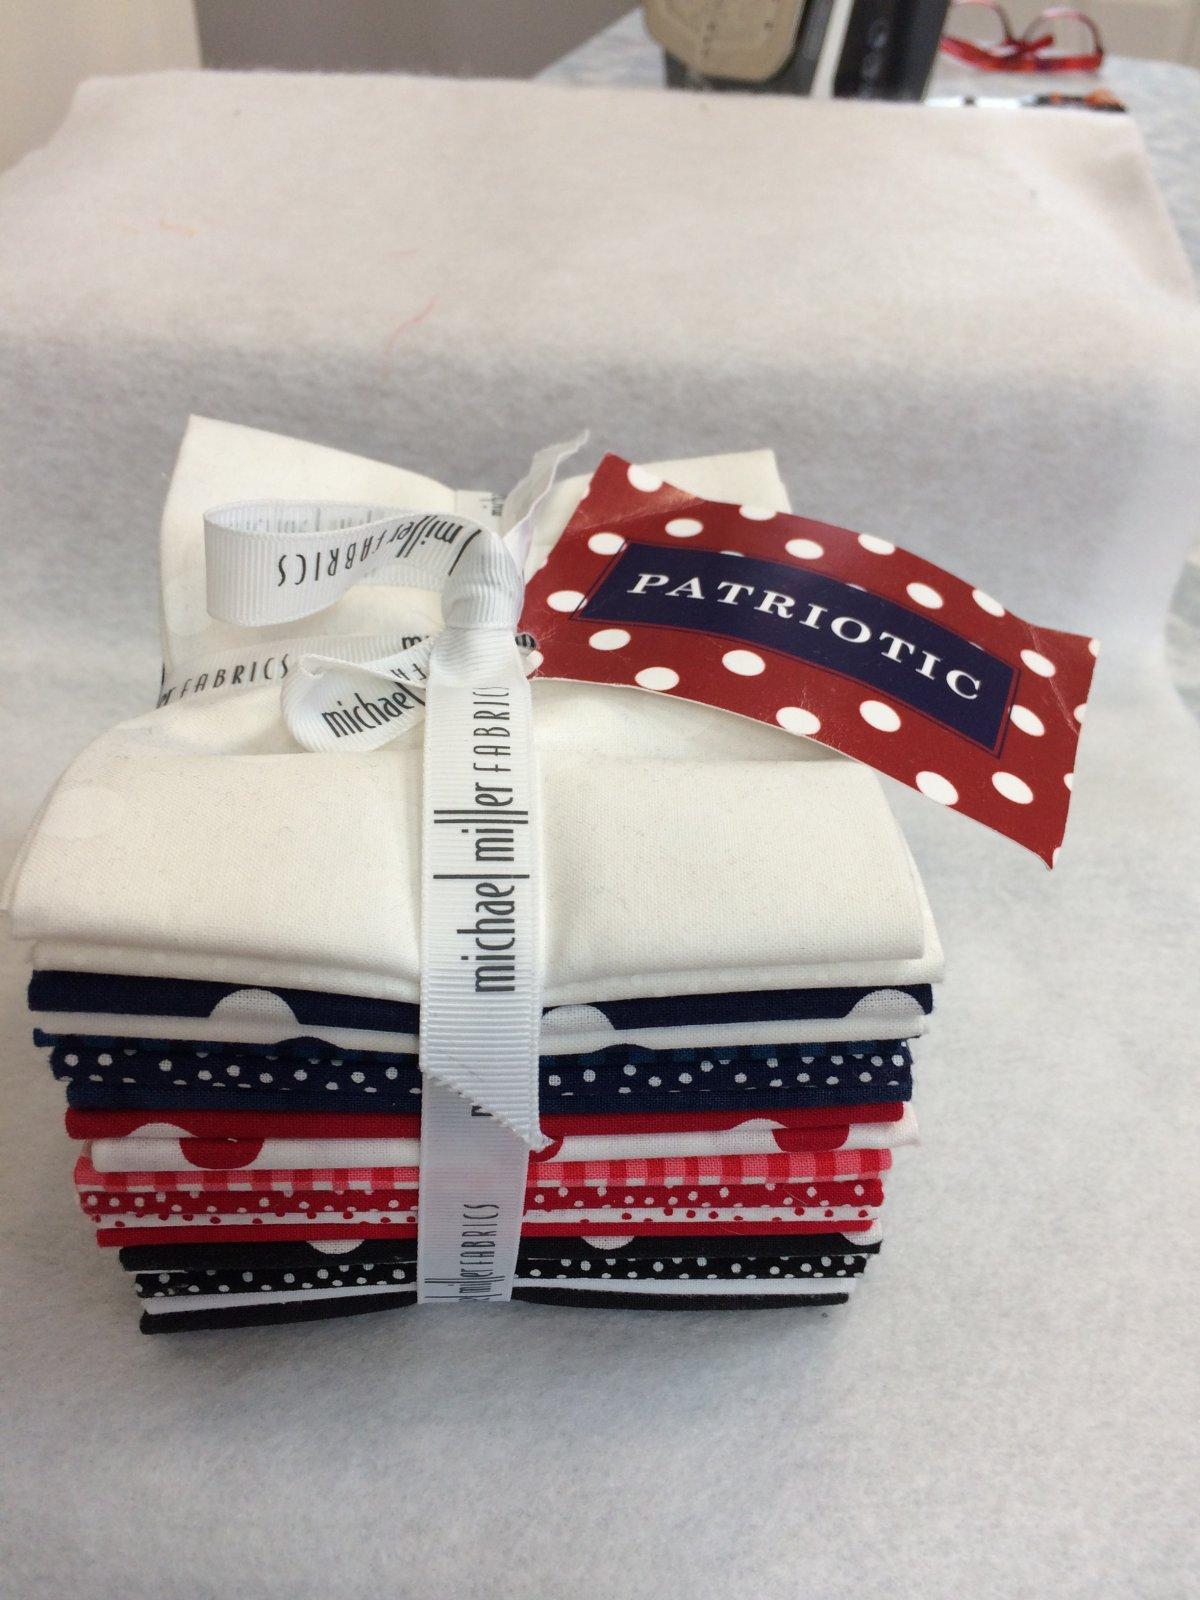 Patriotic Fat Quarter Bundle FQ0164 from Michael Miller